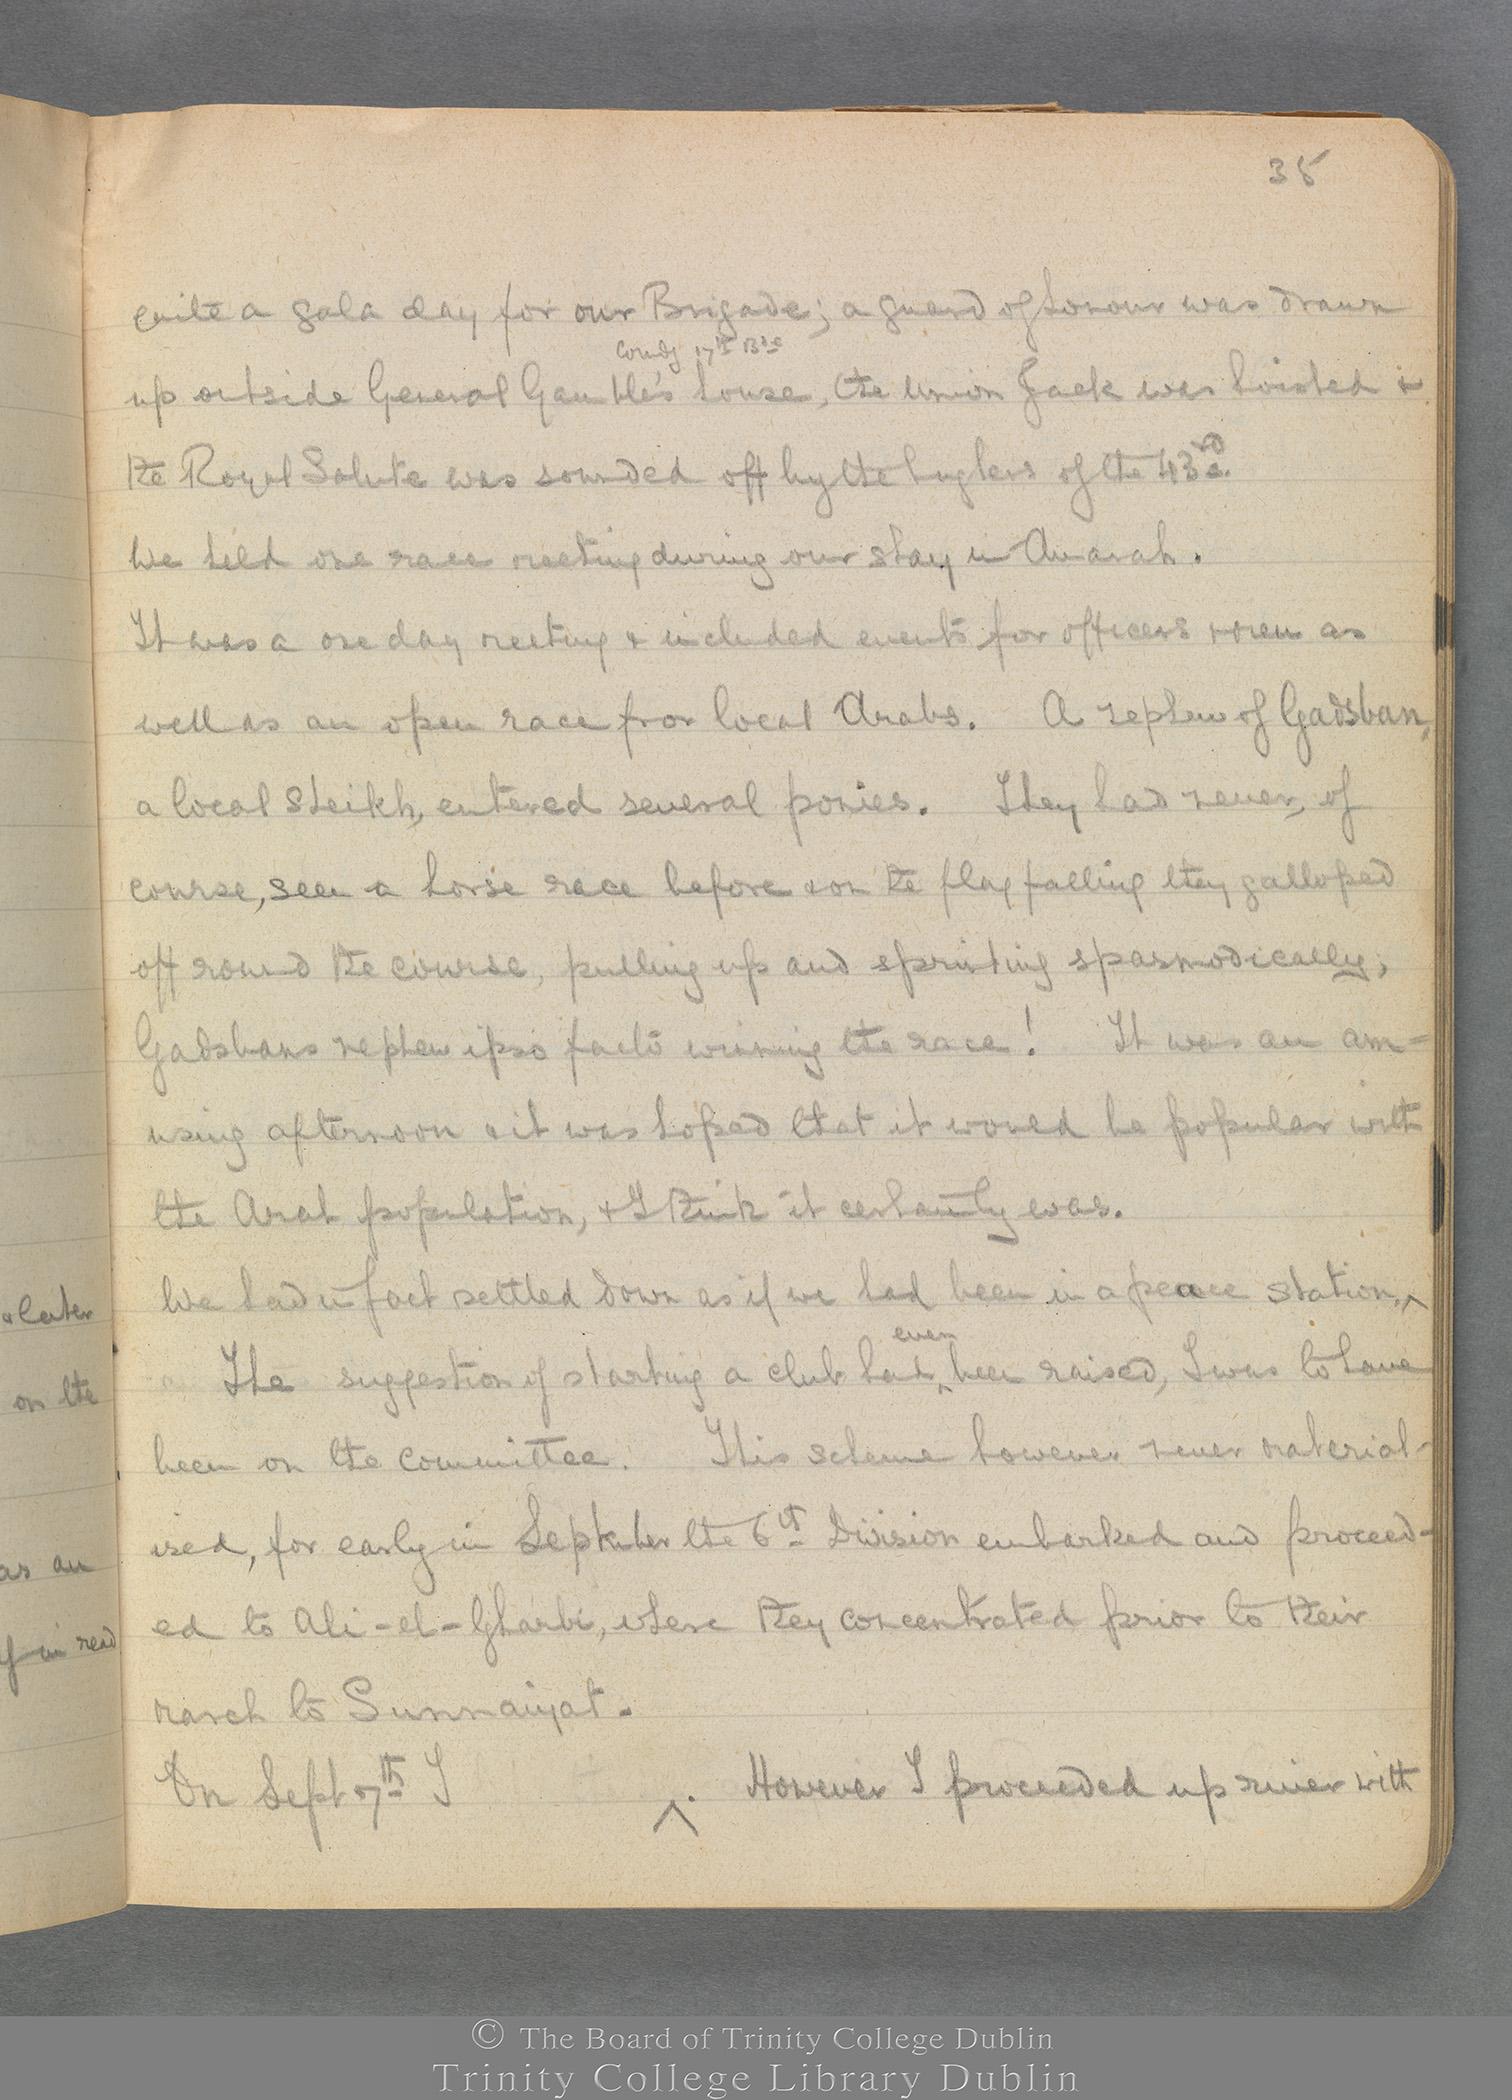 TCD MS 3414 folio 35 recto